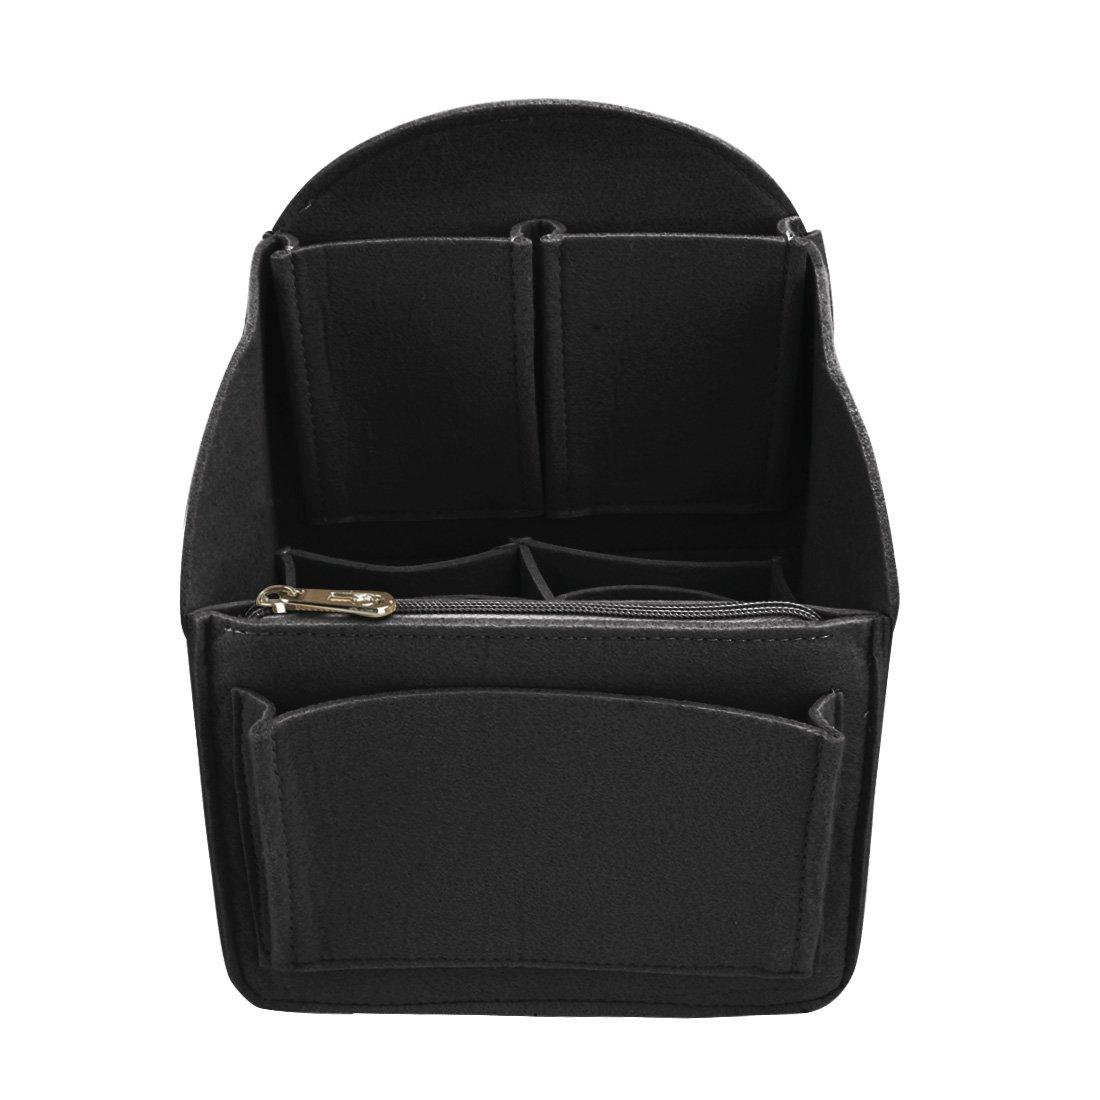 c797425b86d9 Enerhu Felt Backpack Insert Organizer Universal Bag in Bag Men Women ...